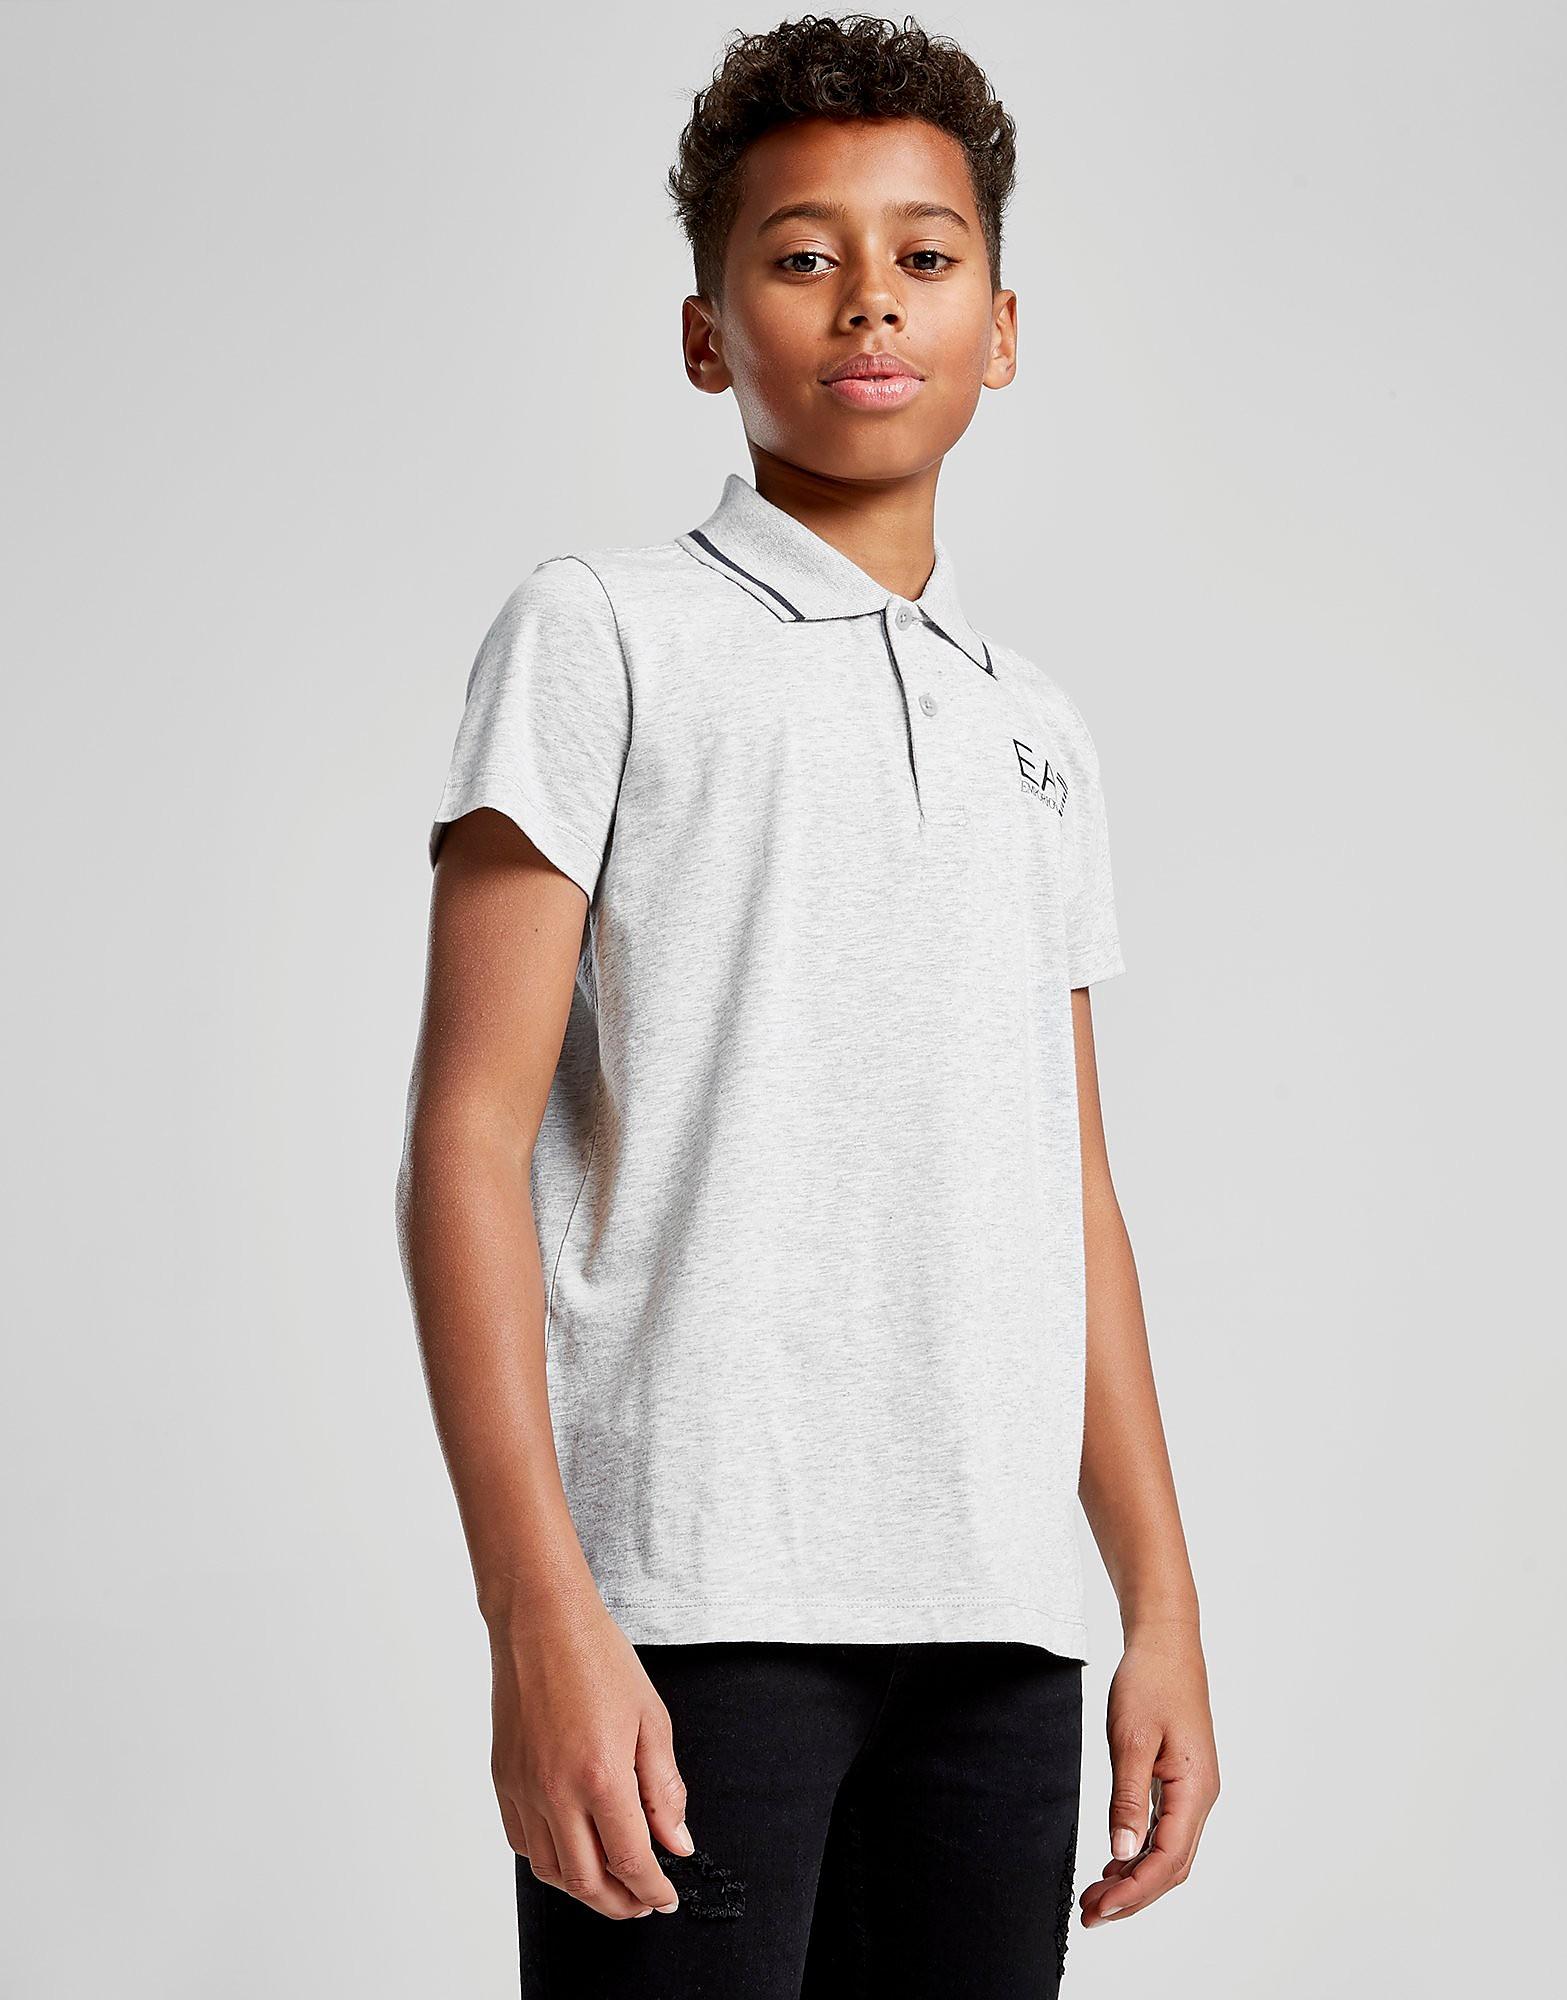 Emporio Armani EA7 Core Jersey Polo Shirt Junior